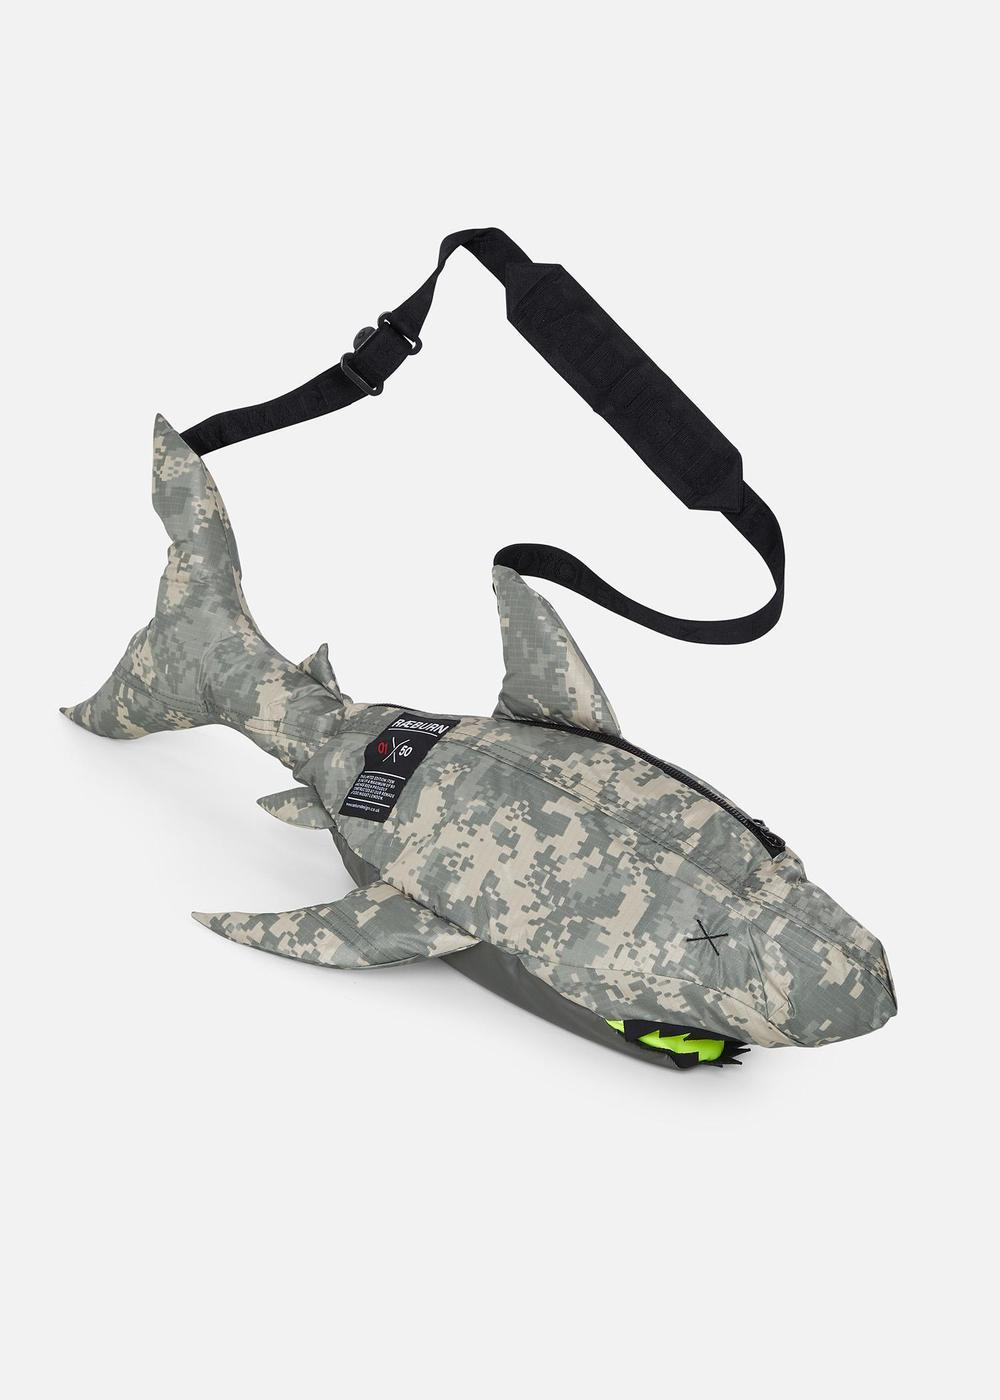 ACU HI-VIS SHARK BAG